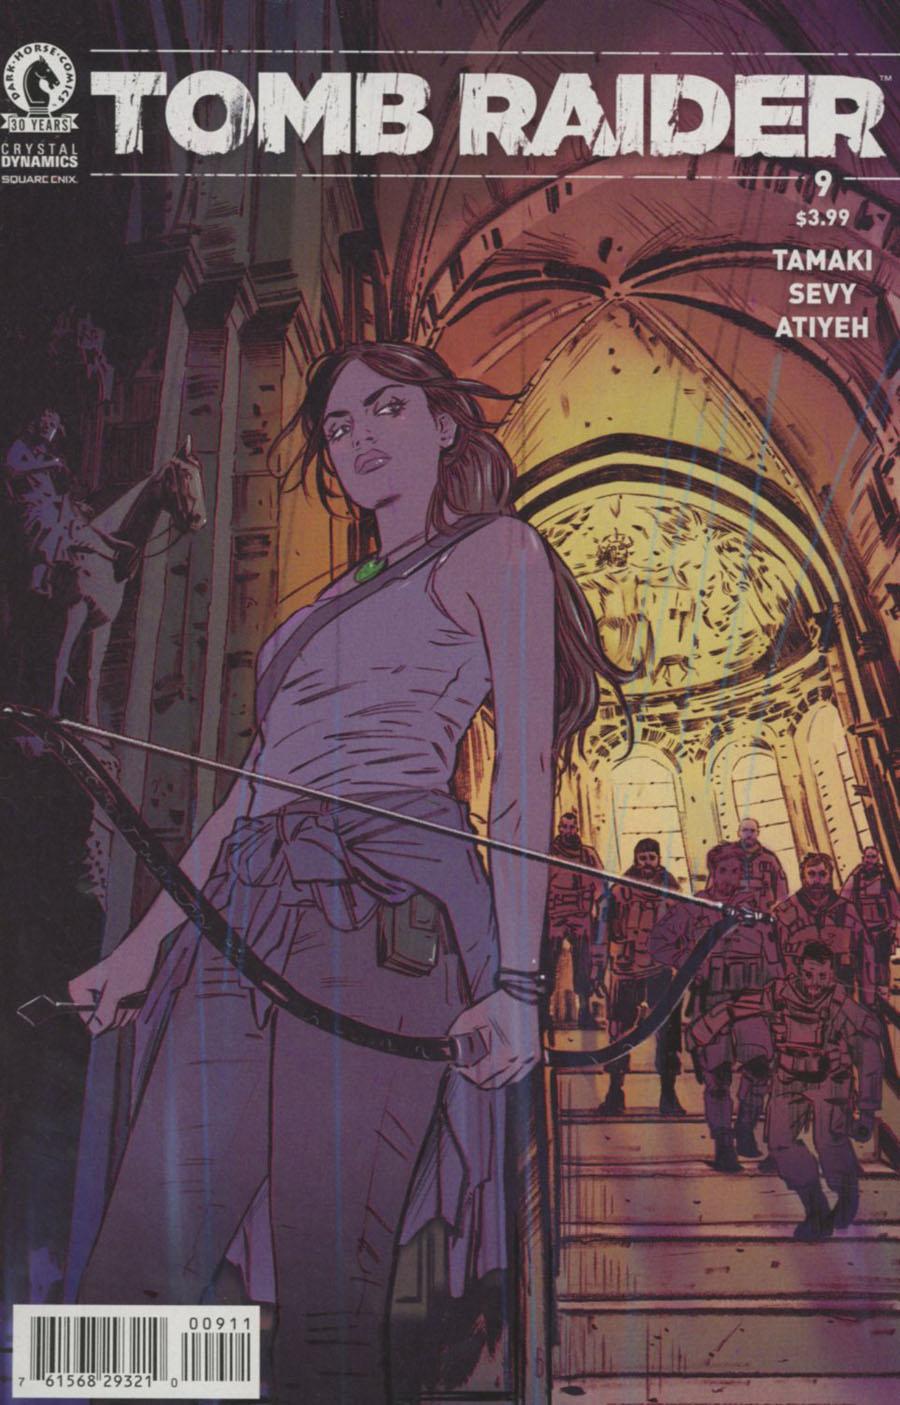 Tomb Raider Vol 3 #9